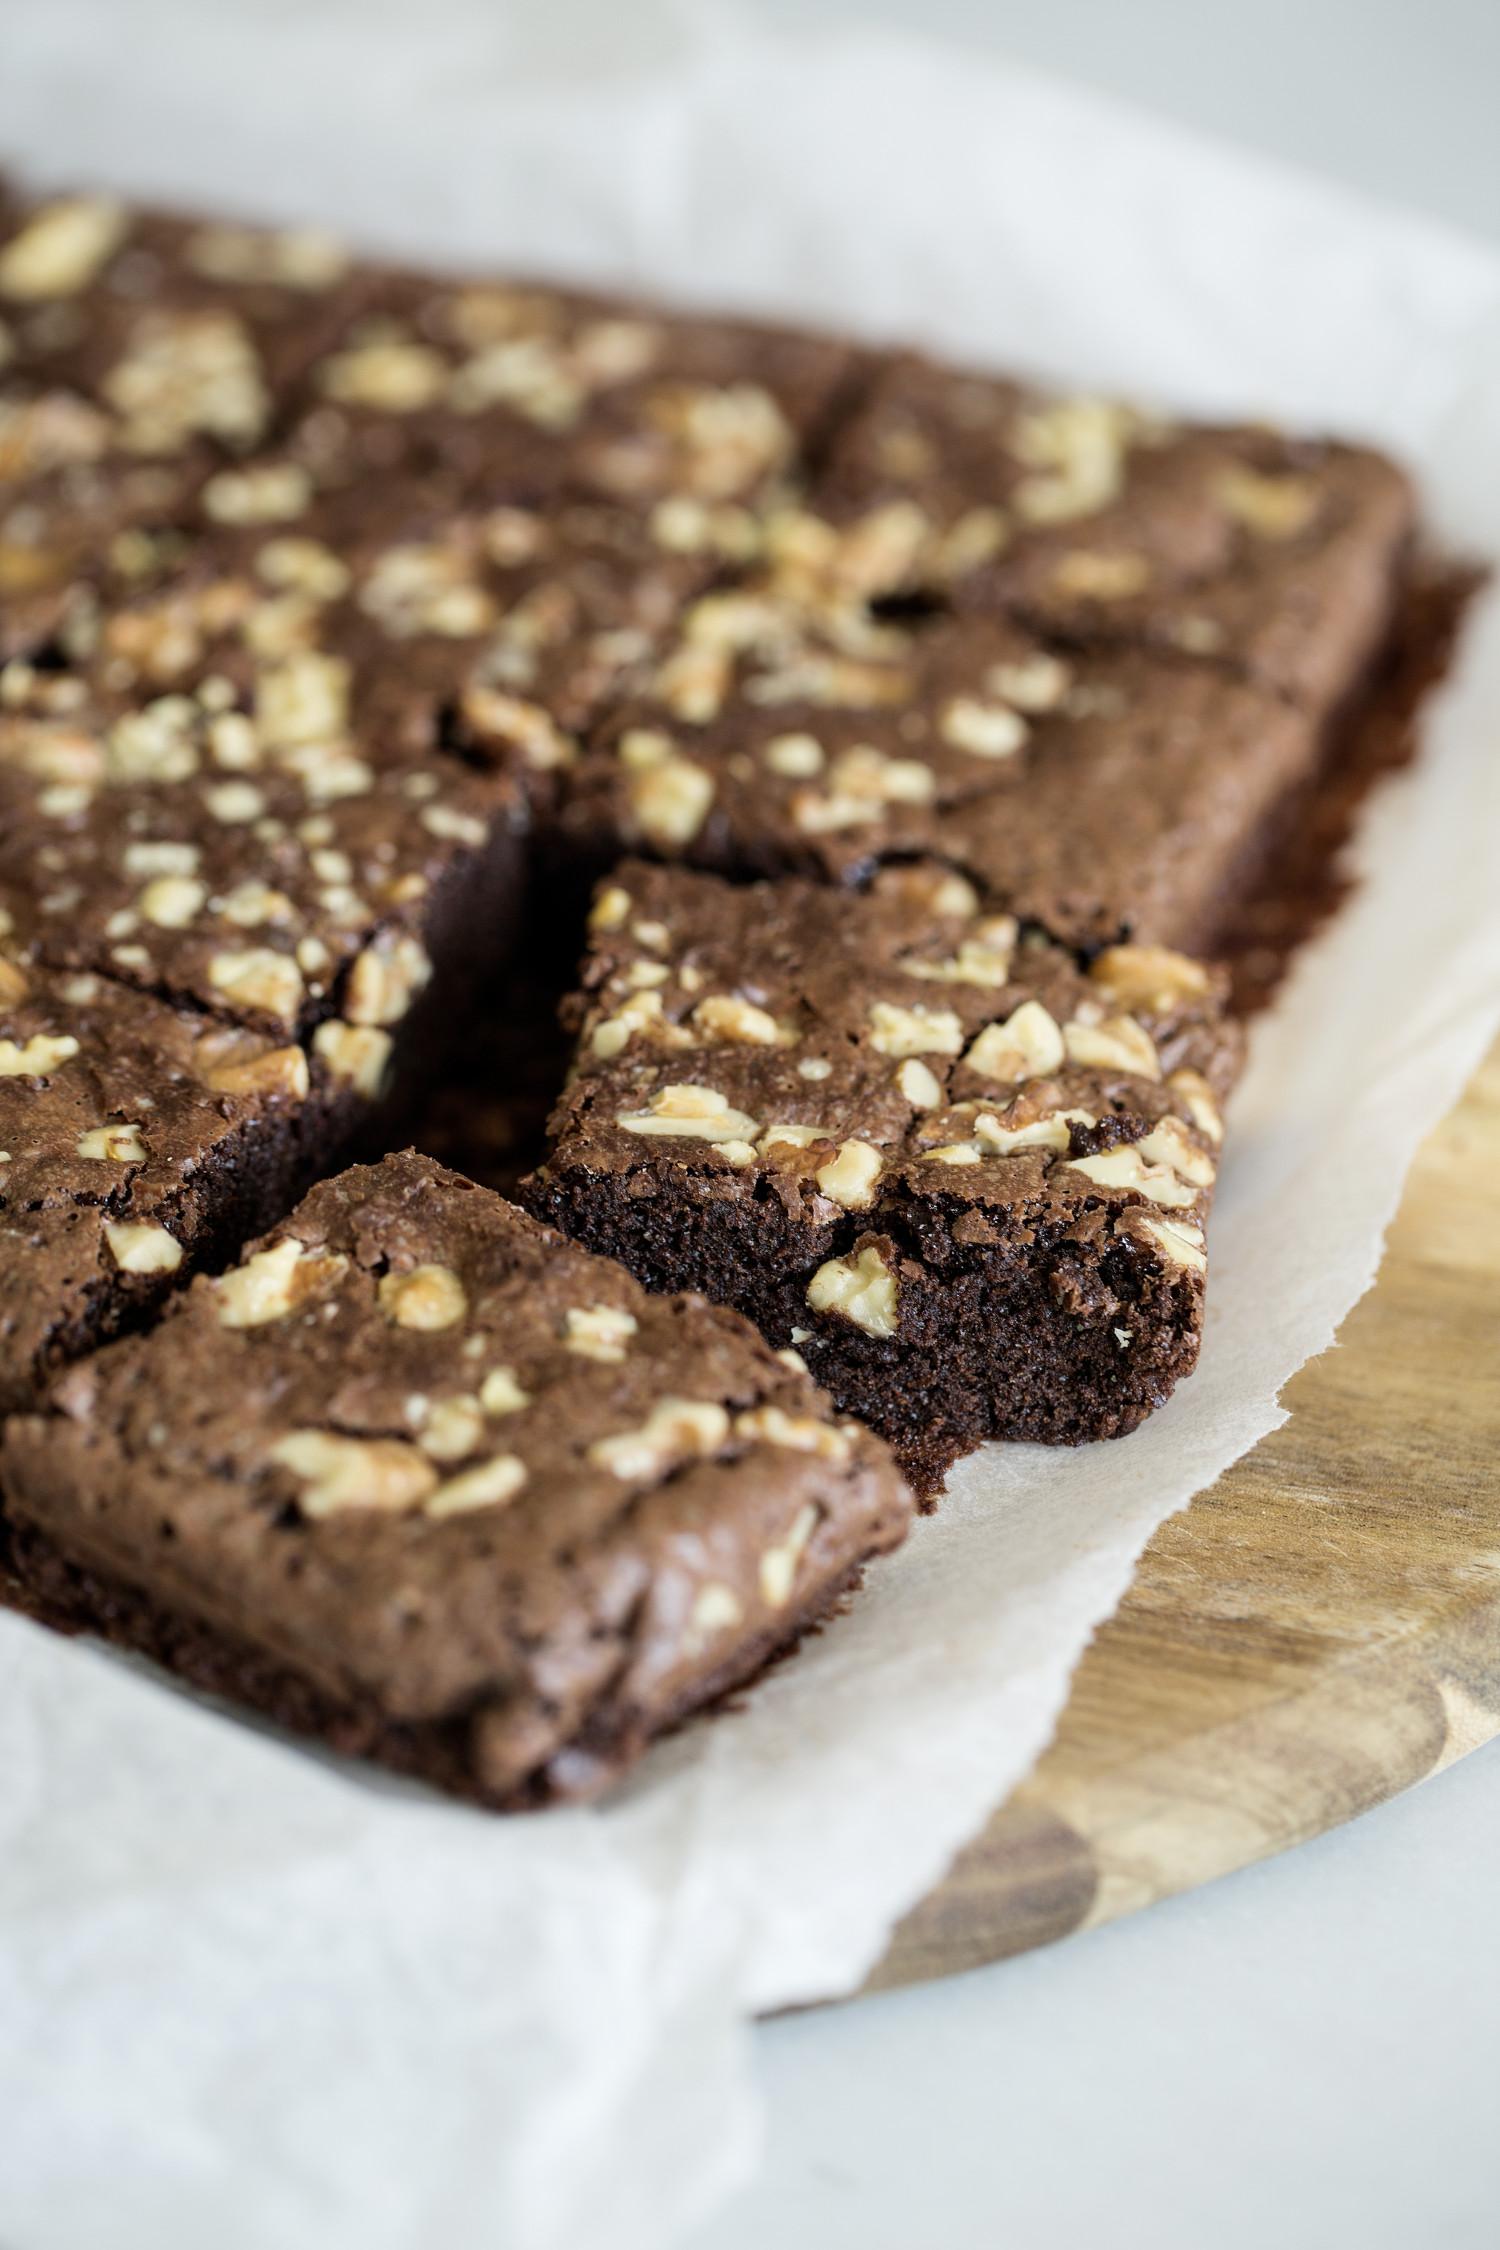 opskrift-paxx-brownies-med-valnodder-annemette-voss